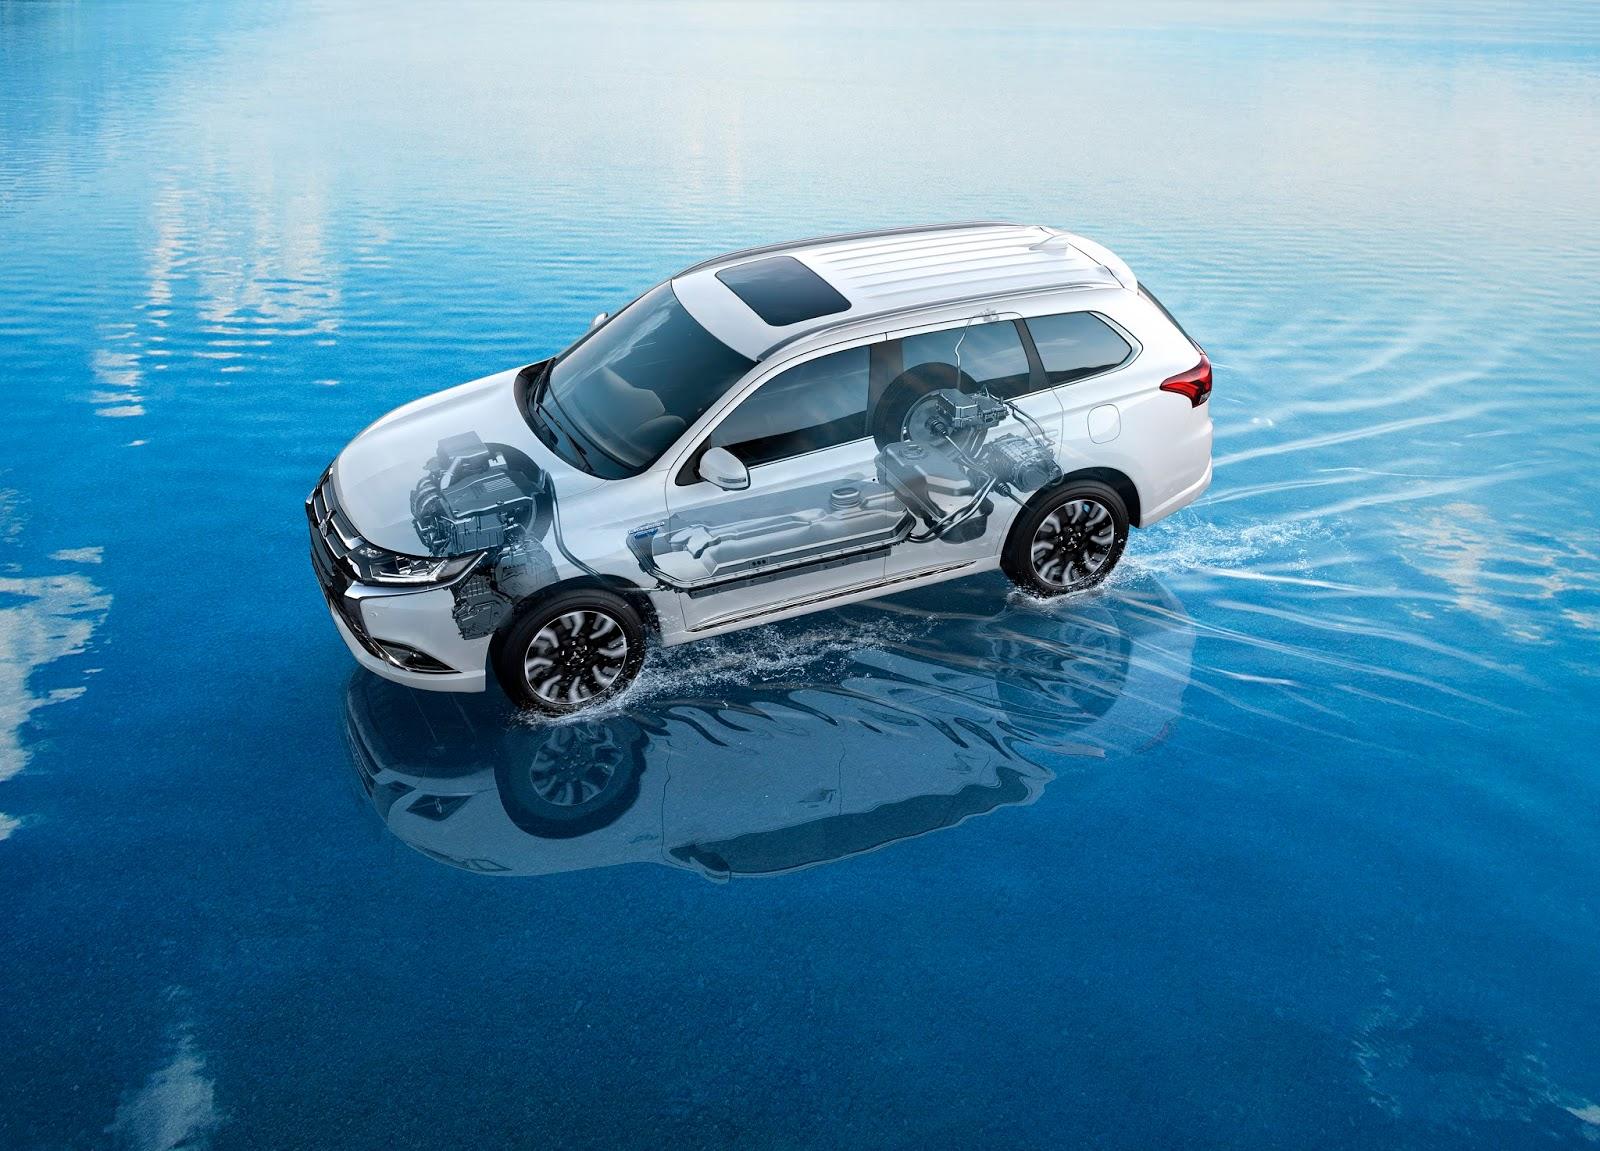 Mitsubishi%2BOutlander%2BPHEV%2BII%2Bgeneration Το υβριδικκό MITSUBISHI OUTLANDER PHEV ξεπέρασε τις 50.000 πωλήσεις στην Ευρώπη